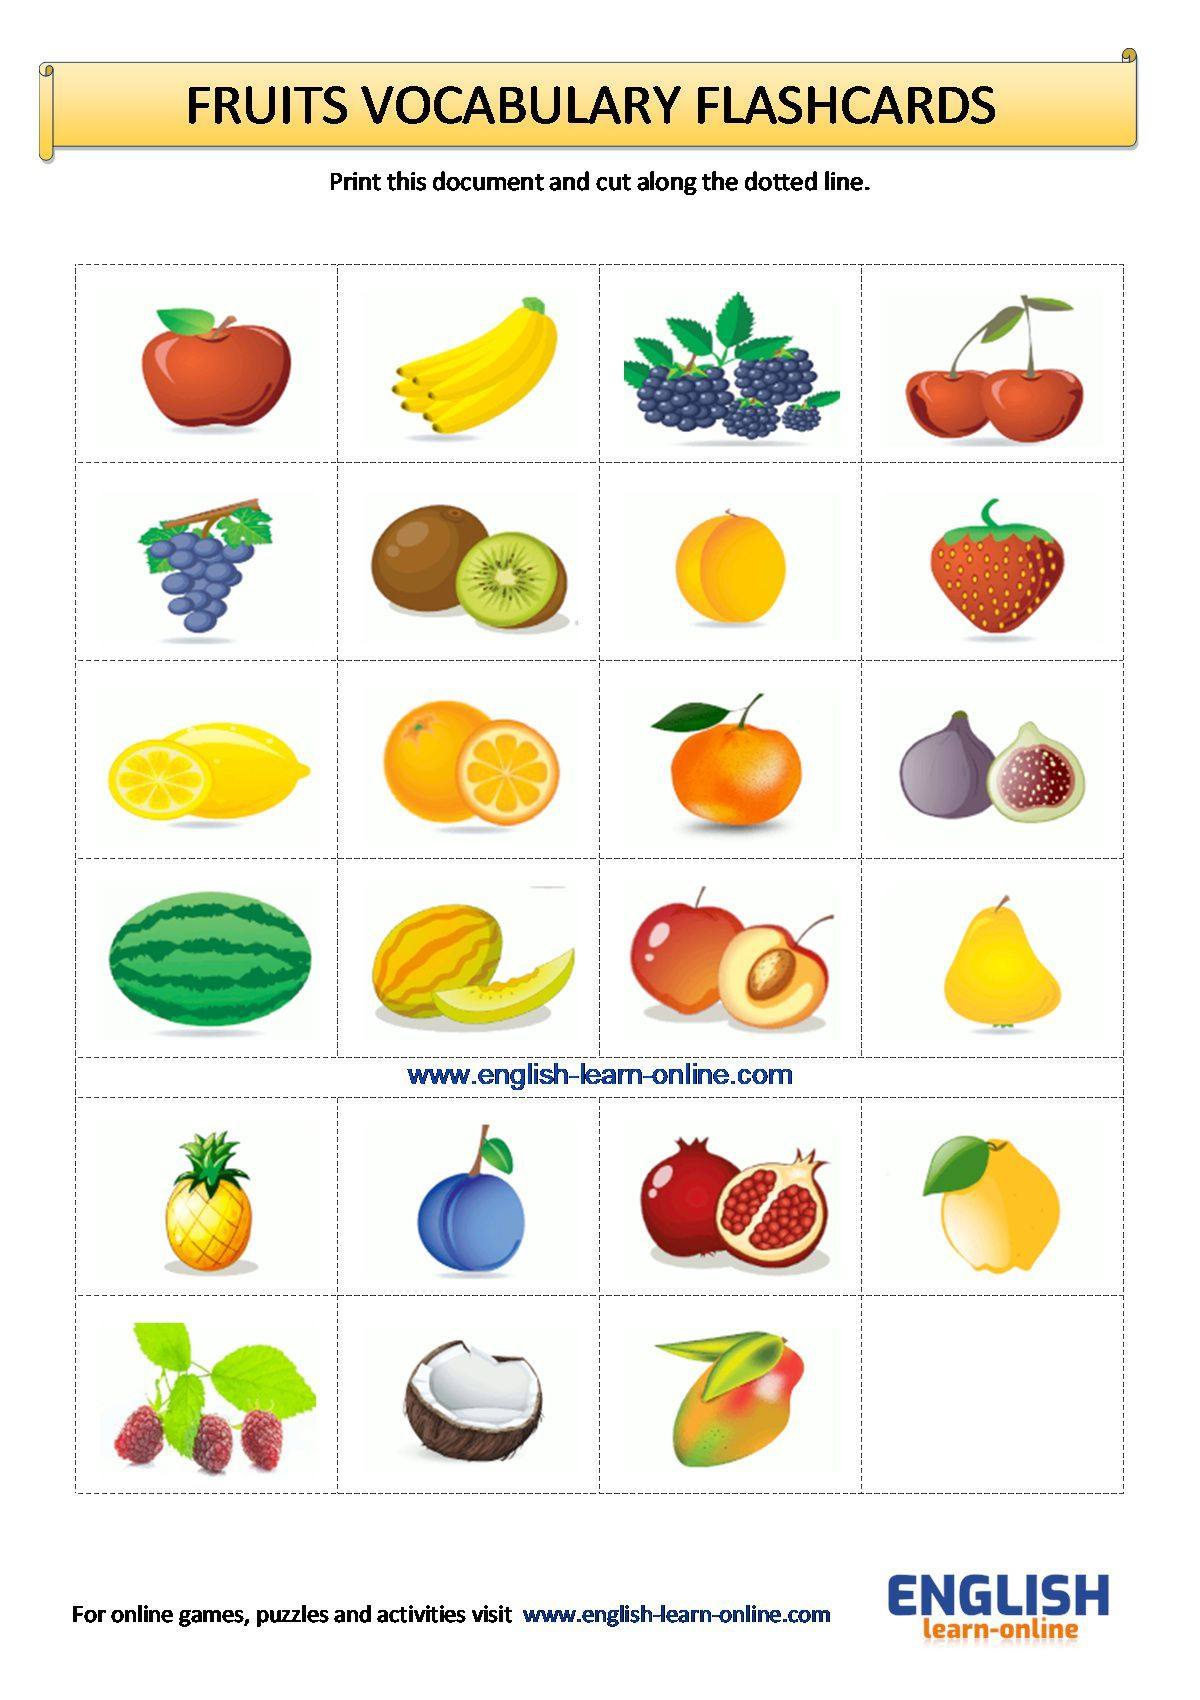 Fruits Vocabulary Flashcards Worksheet In